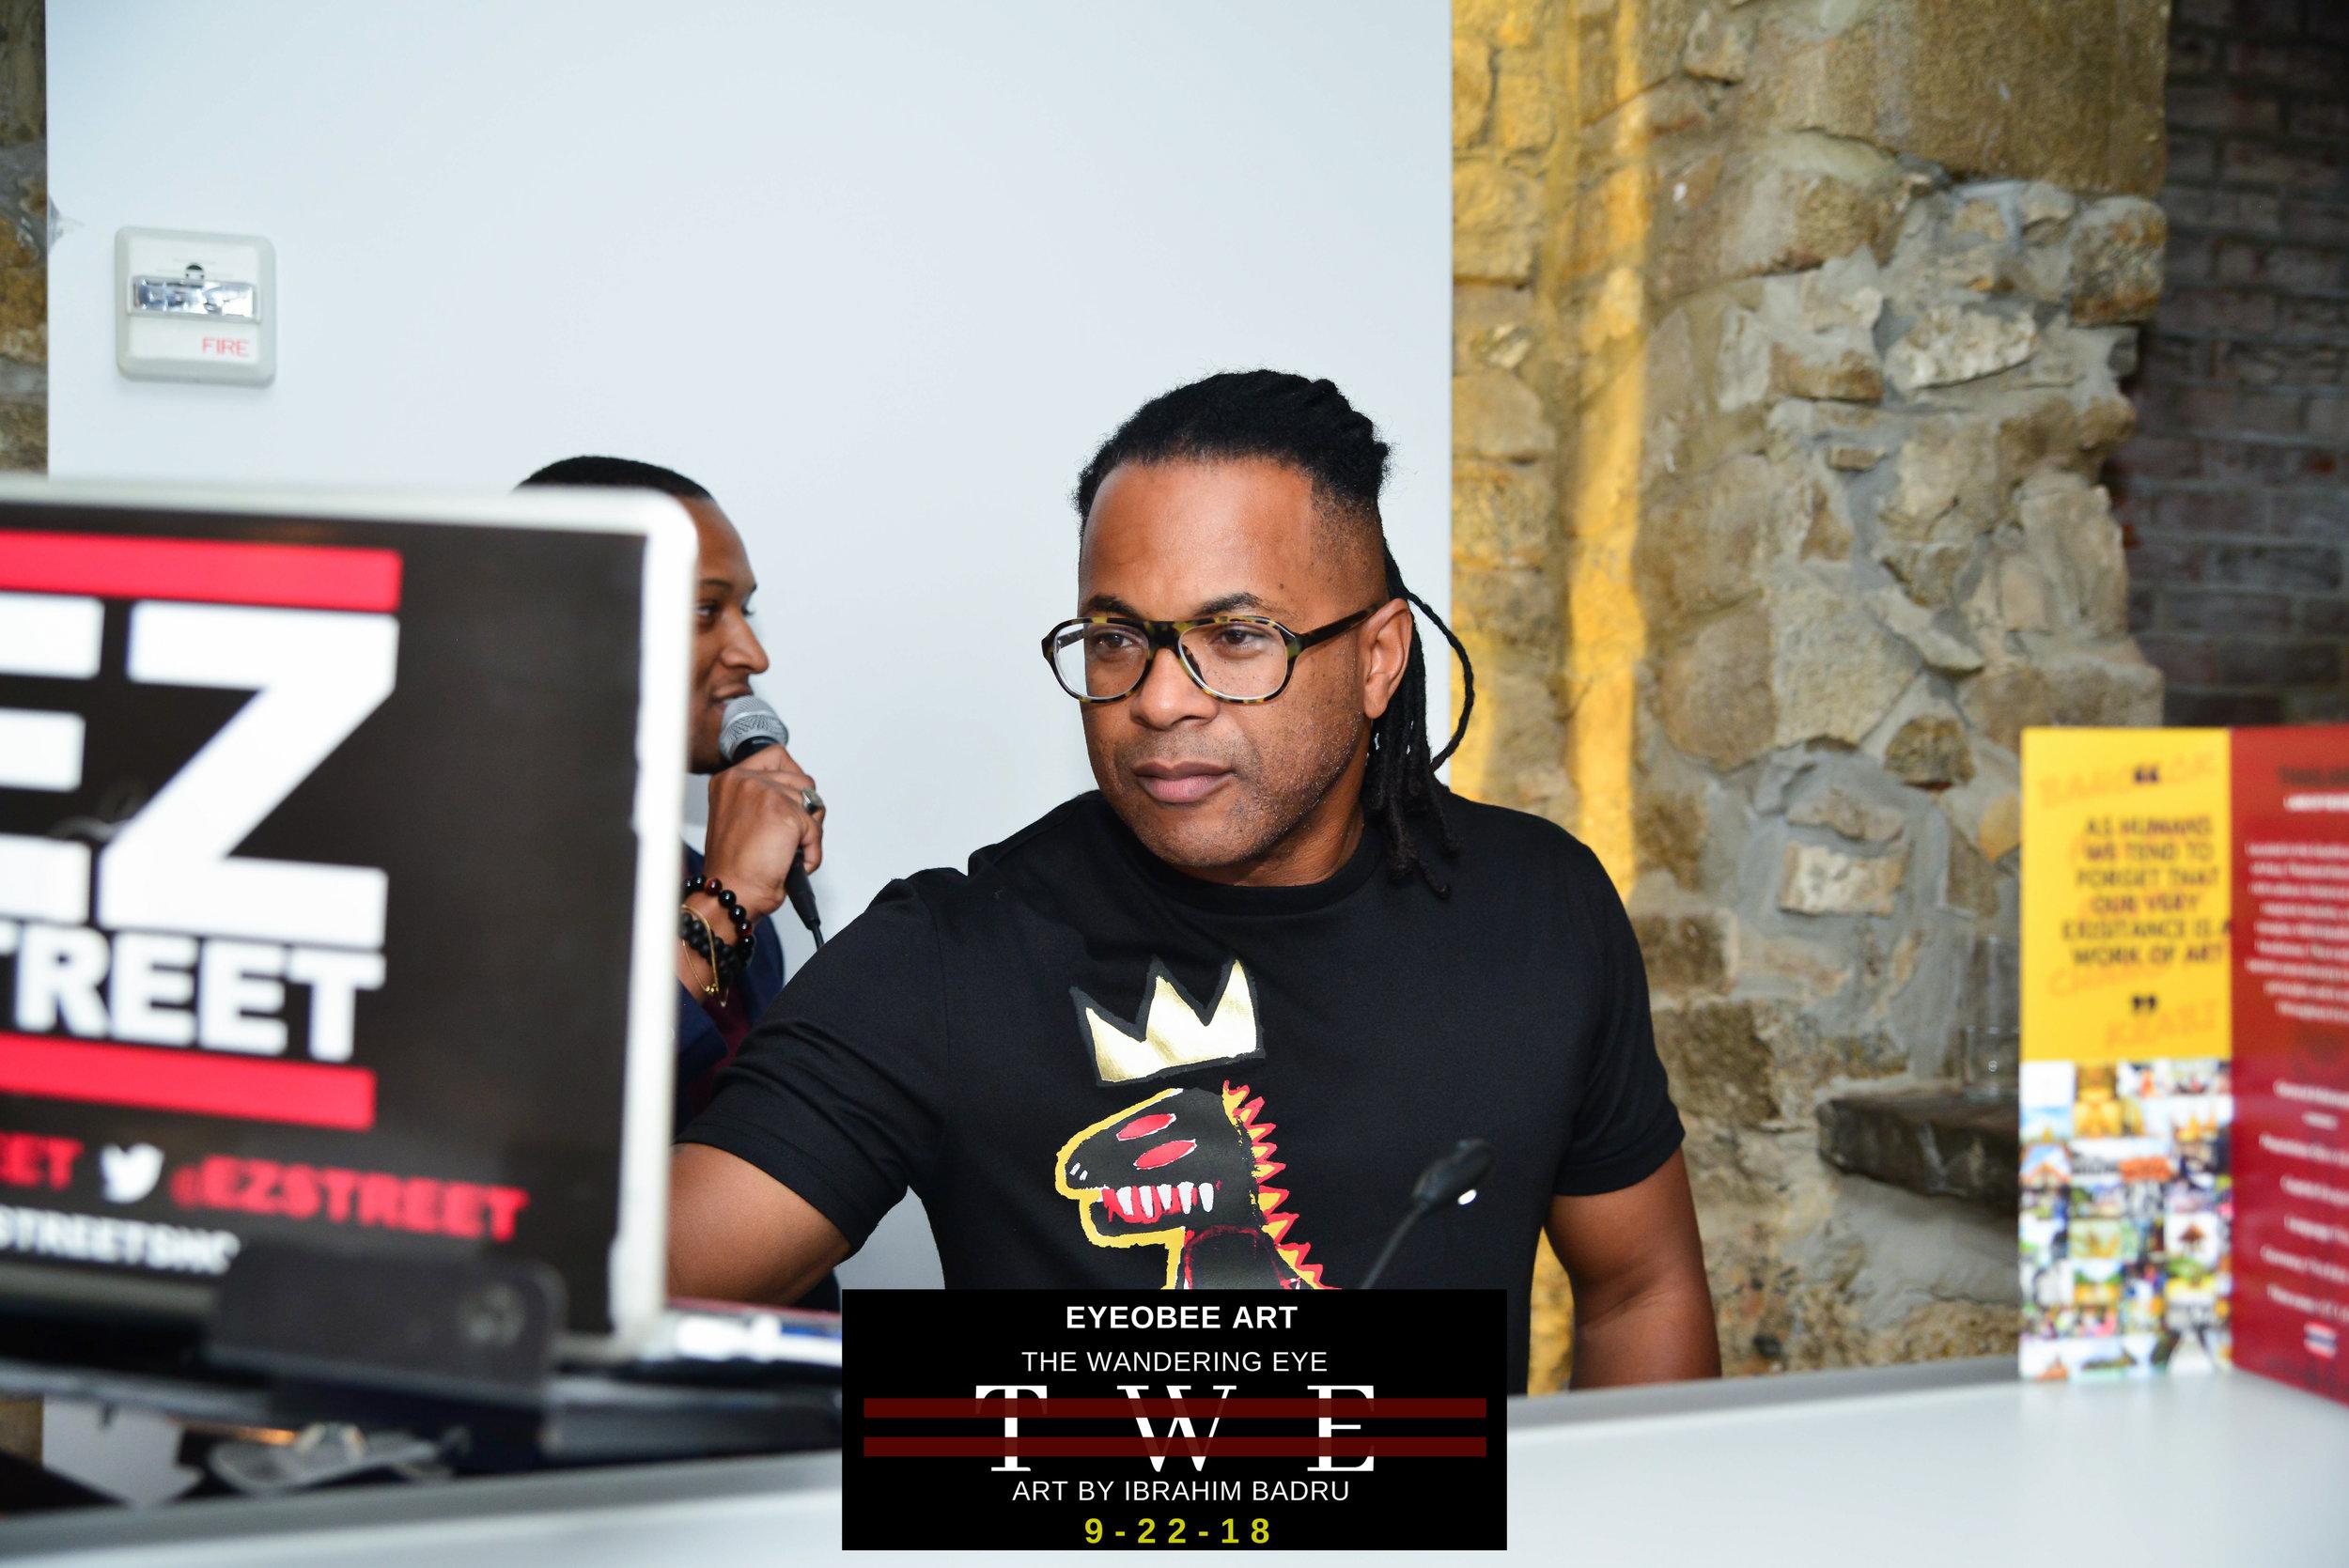 Special Guest DJ EZ Street